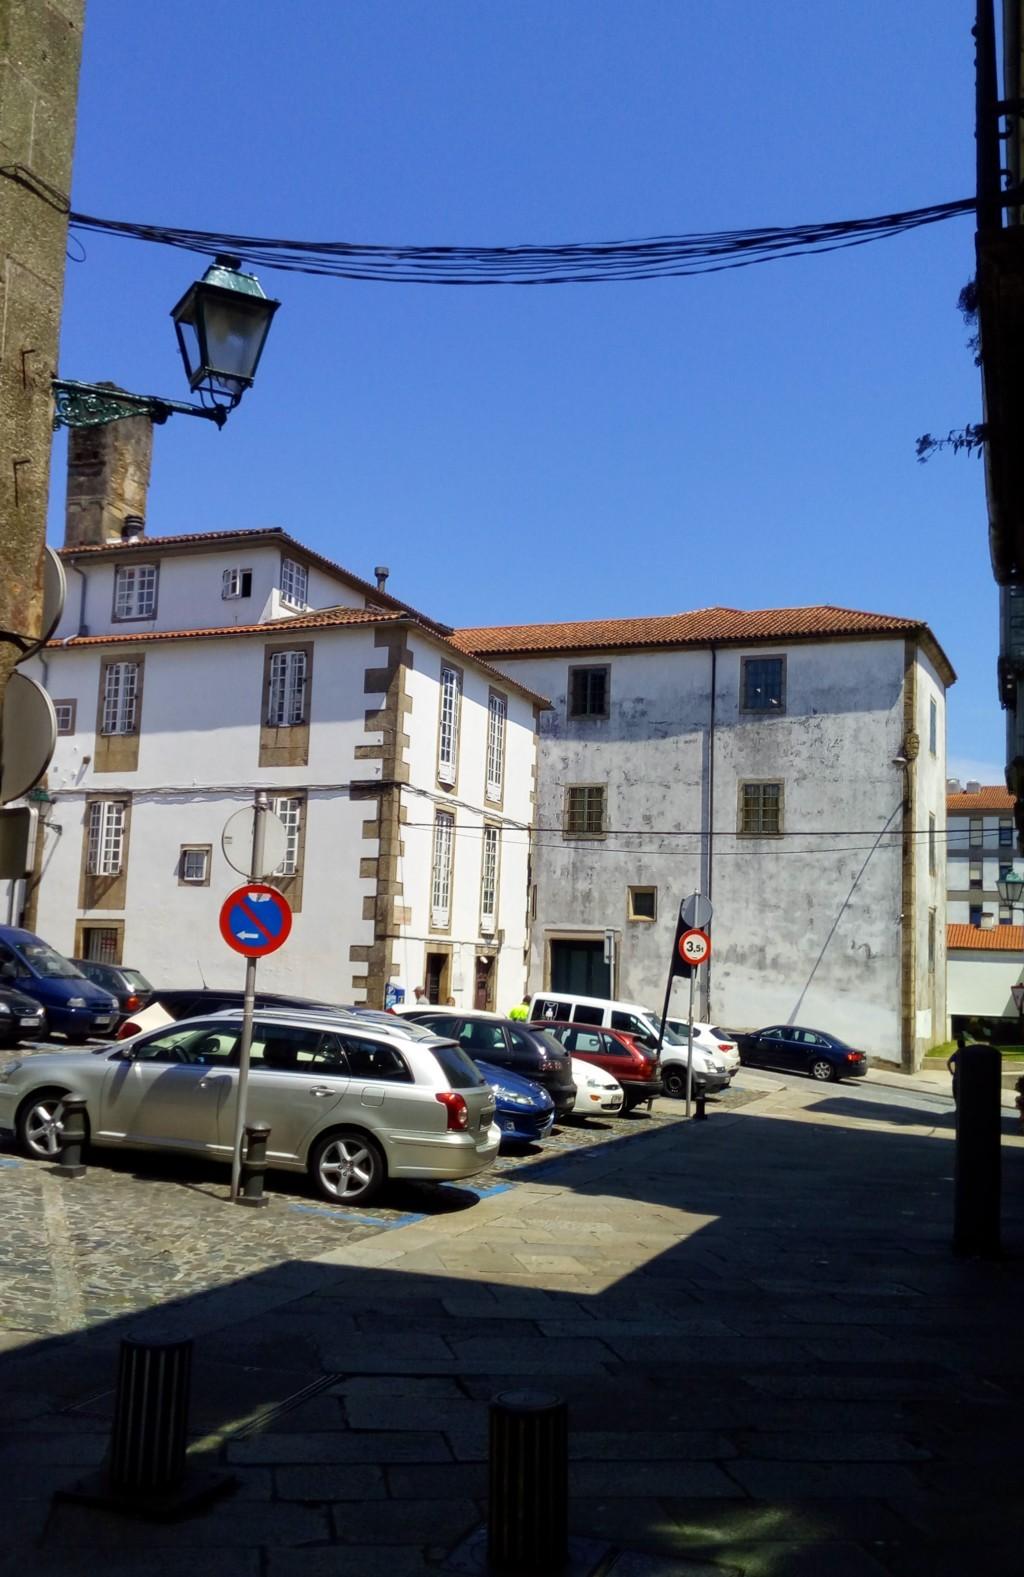 Foto 6 - Llegando a la Plaza da Algalia de Abaixo, al frente Rúa das Rodas